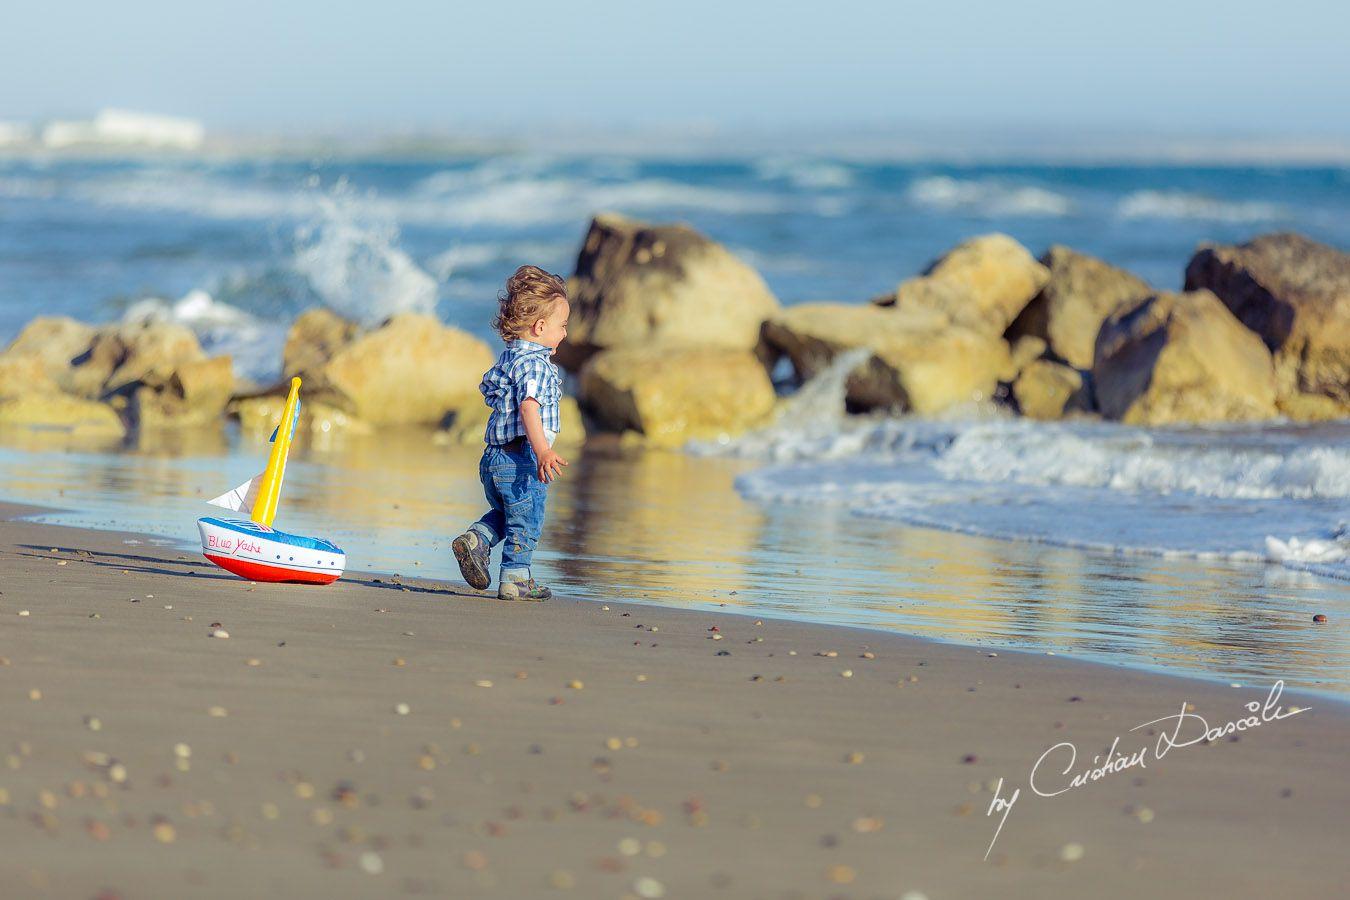 Precious moments: Harry at Curium Beach, Cyprus. Photographer: Cristian Dascalu